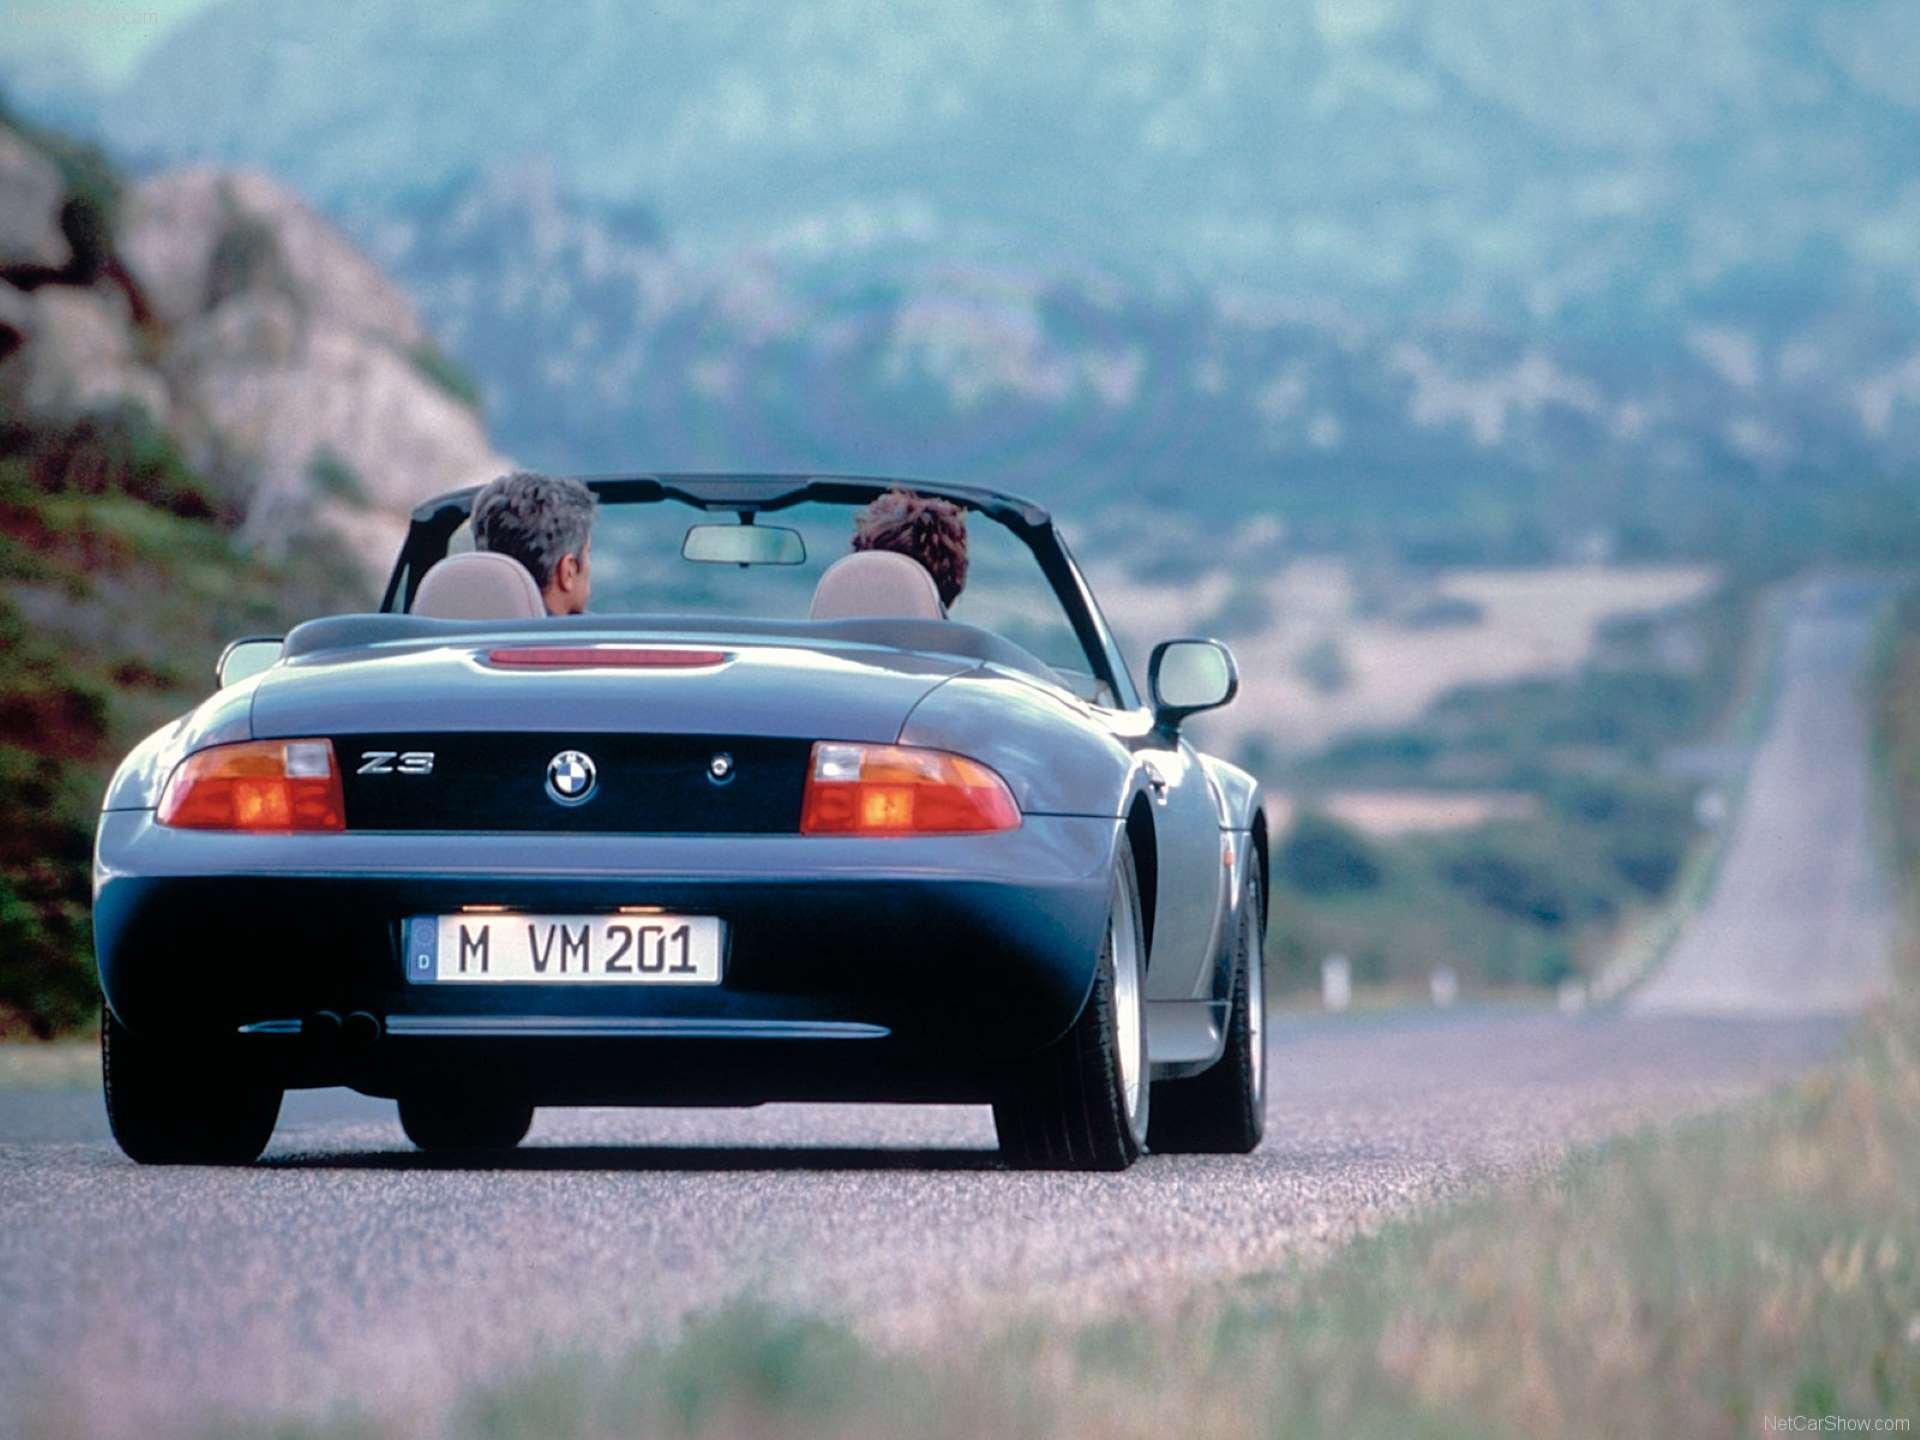 Pandemic No Appreciation BMW Z3 Roadster rear